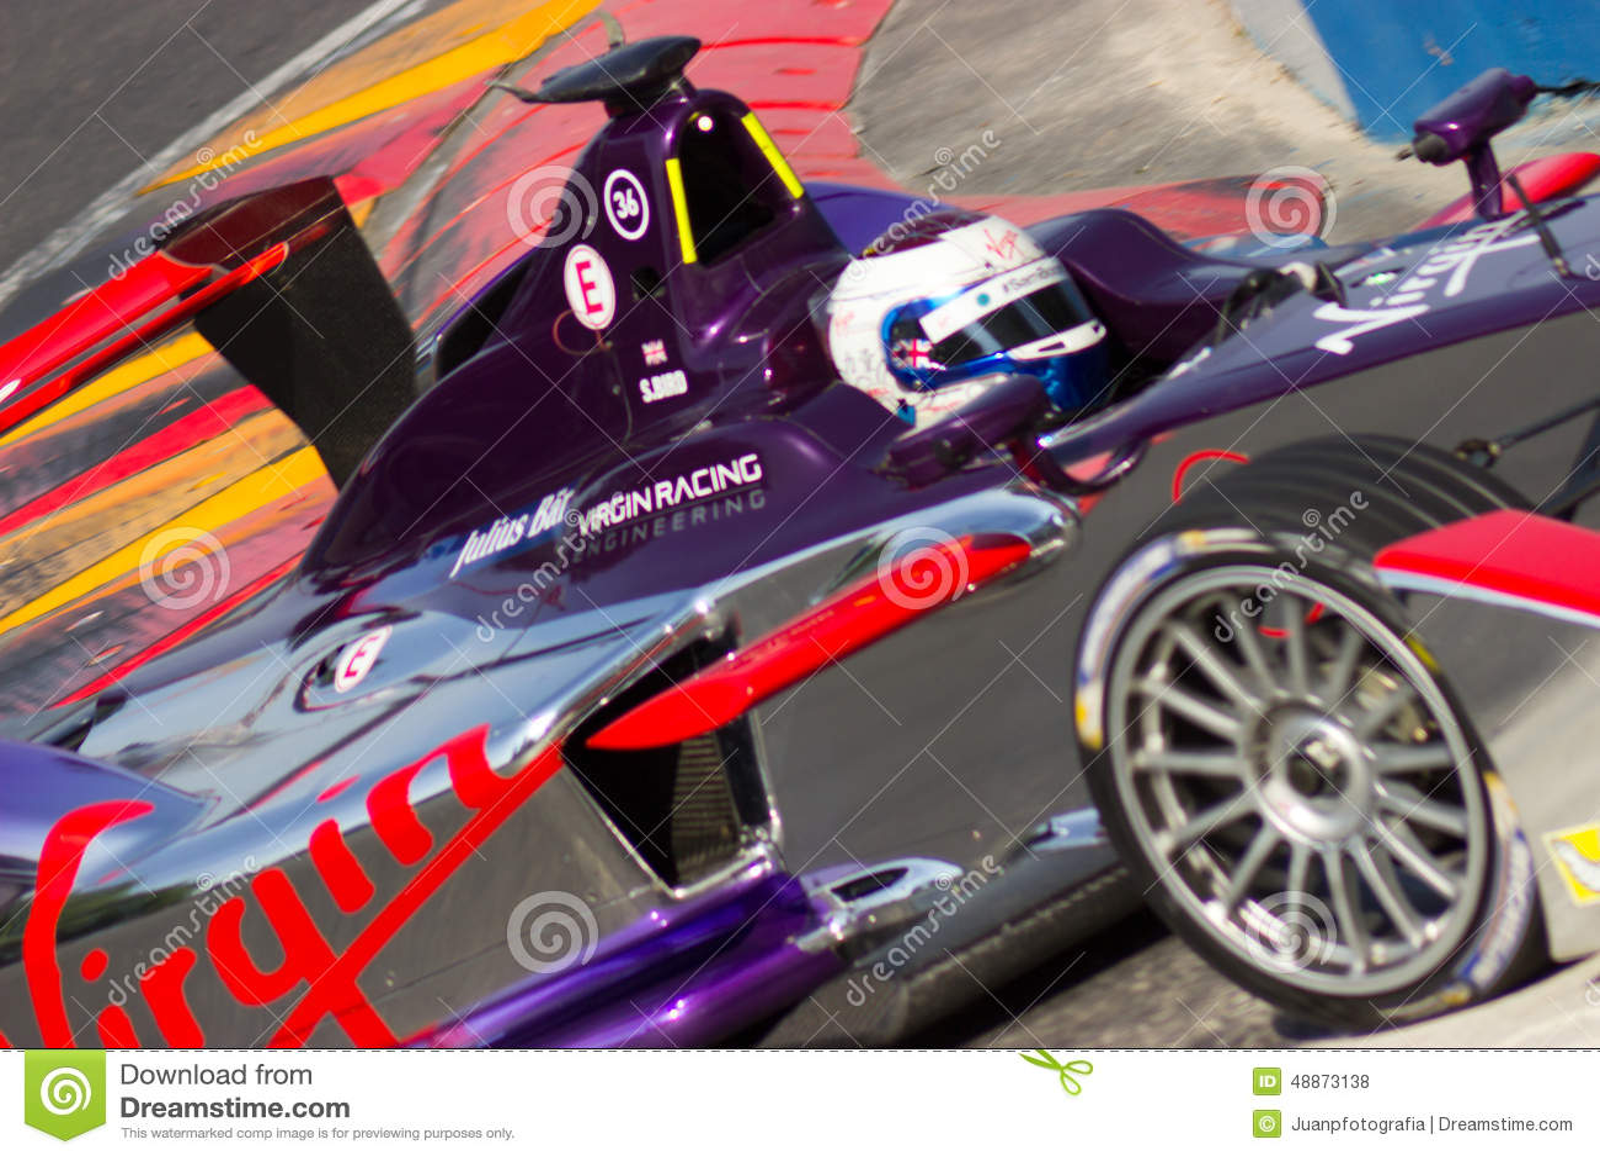 Download Sam Bird editorial stock photo. Image of sports, racing - 48873138